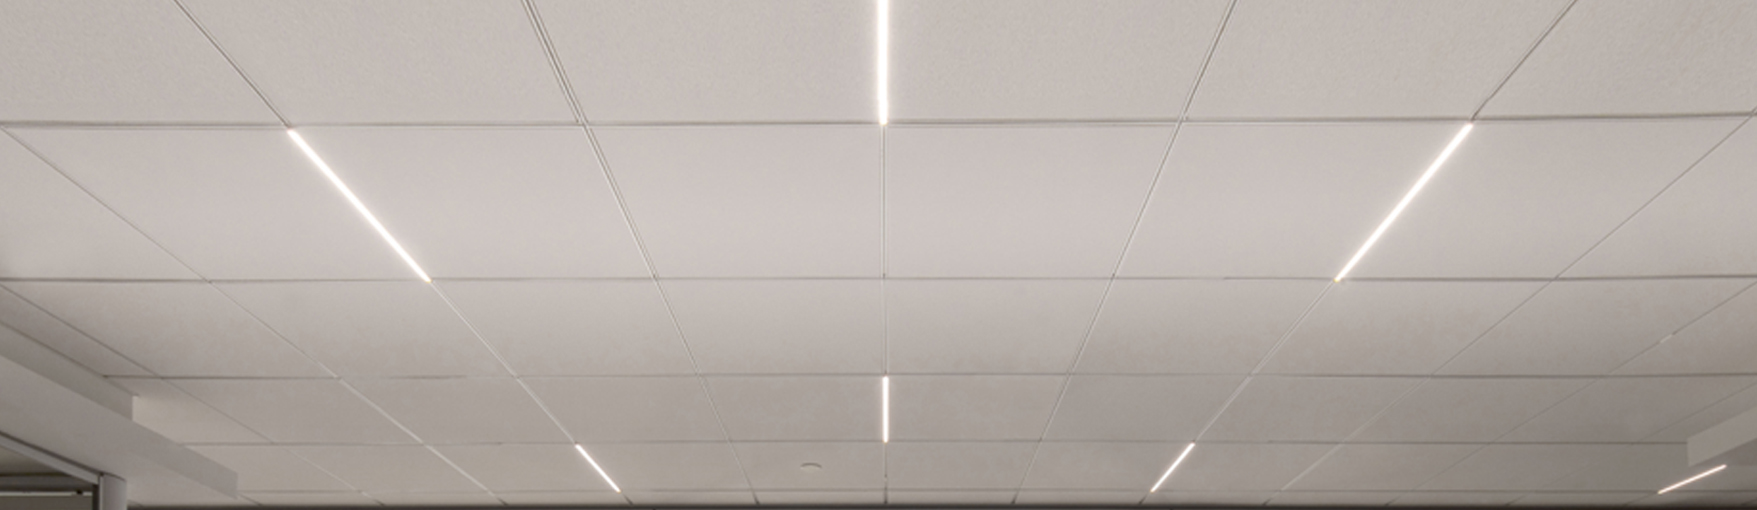 tbar led smartlight led light